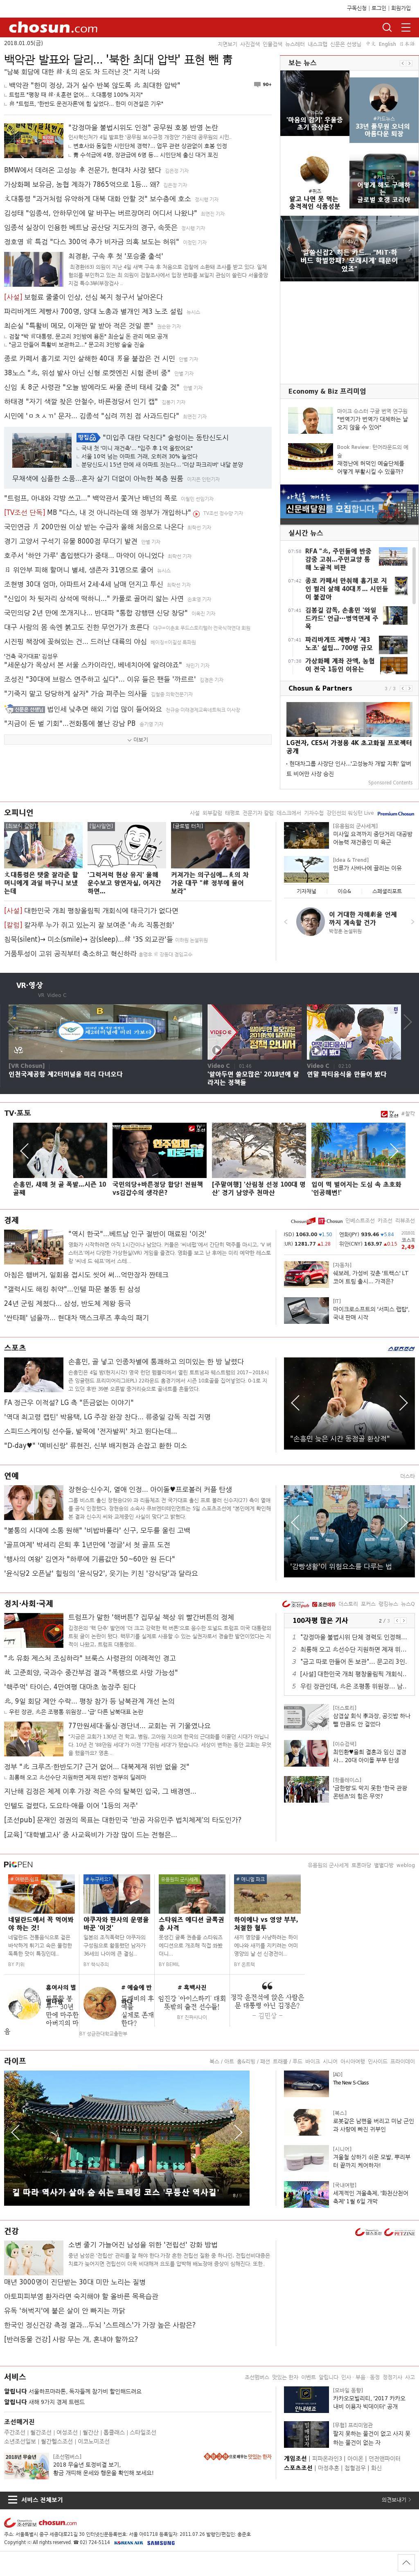 chosun.com at Friday Jan. 5, 2018, 8:01 a.m. UTC